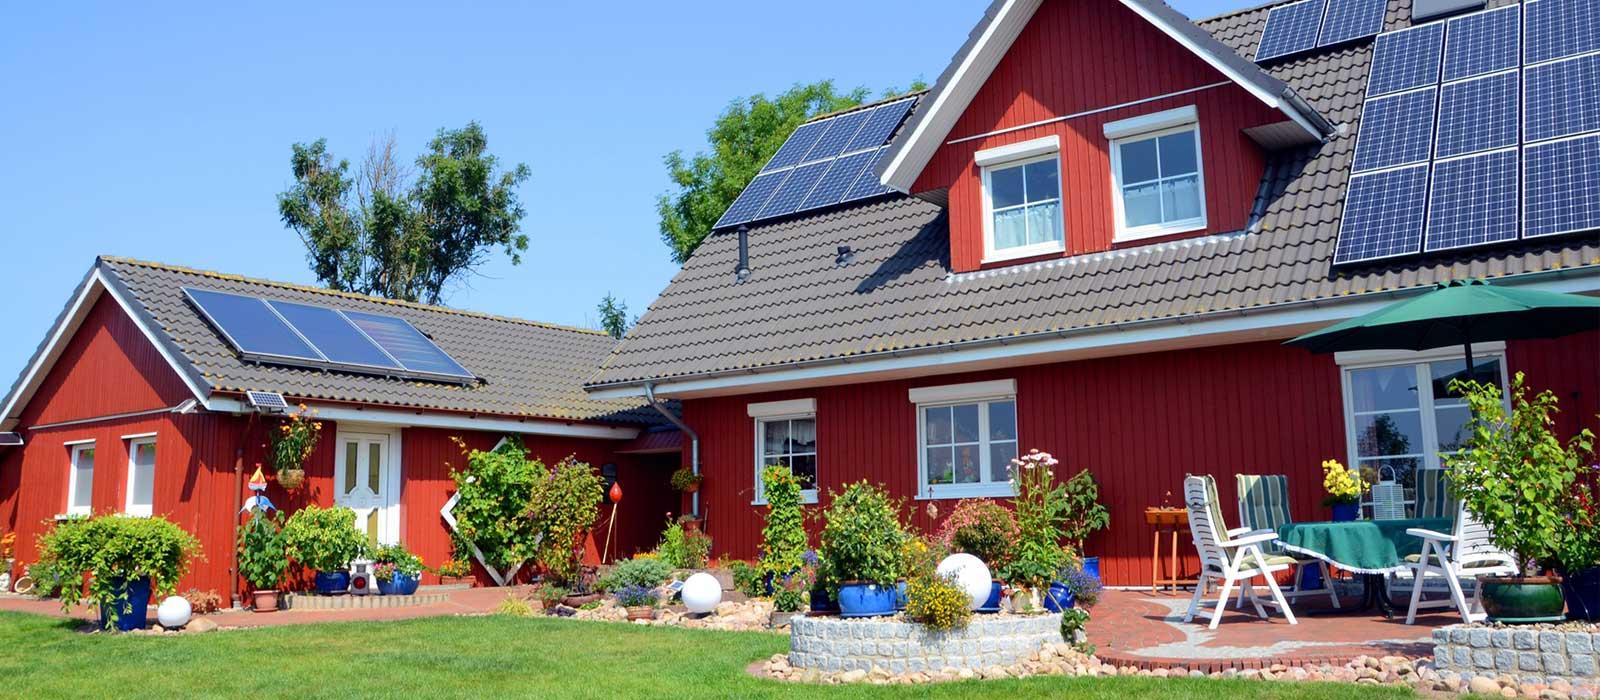 Photovoltaik - regenerative Energie